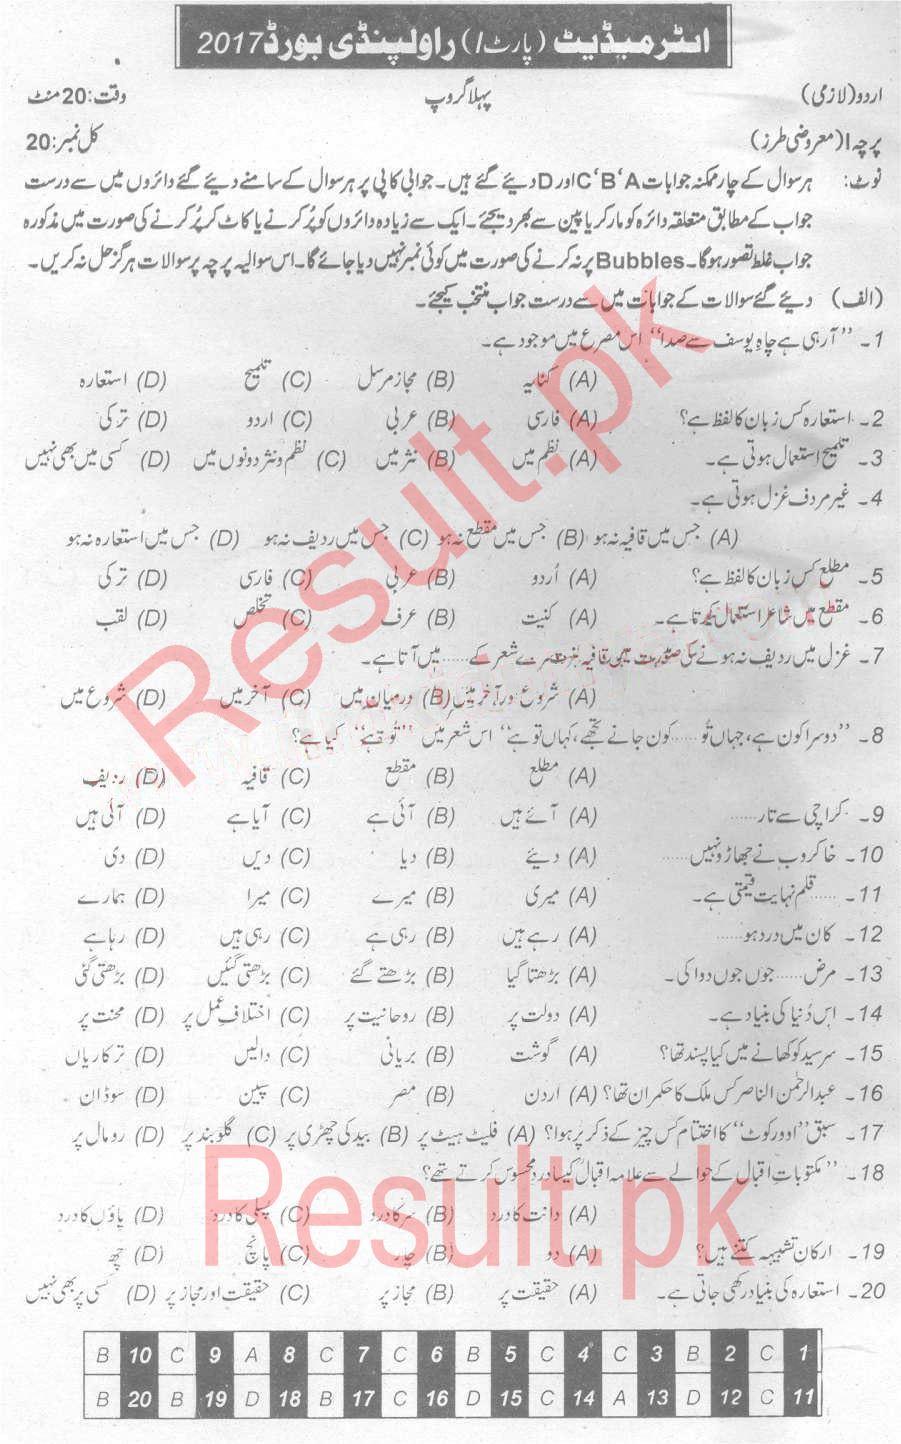 BISE Rawalpindi Board Past Papers 2018 Inter Part 1 2, FA, HSSC, FSC